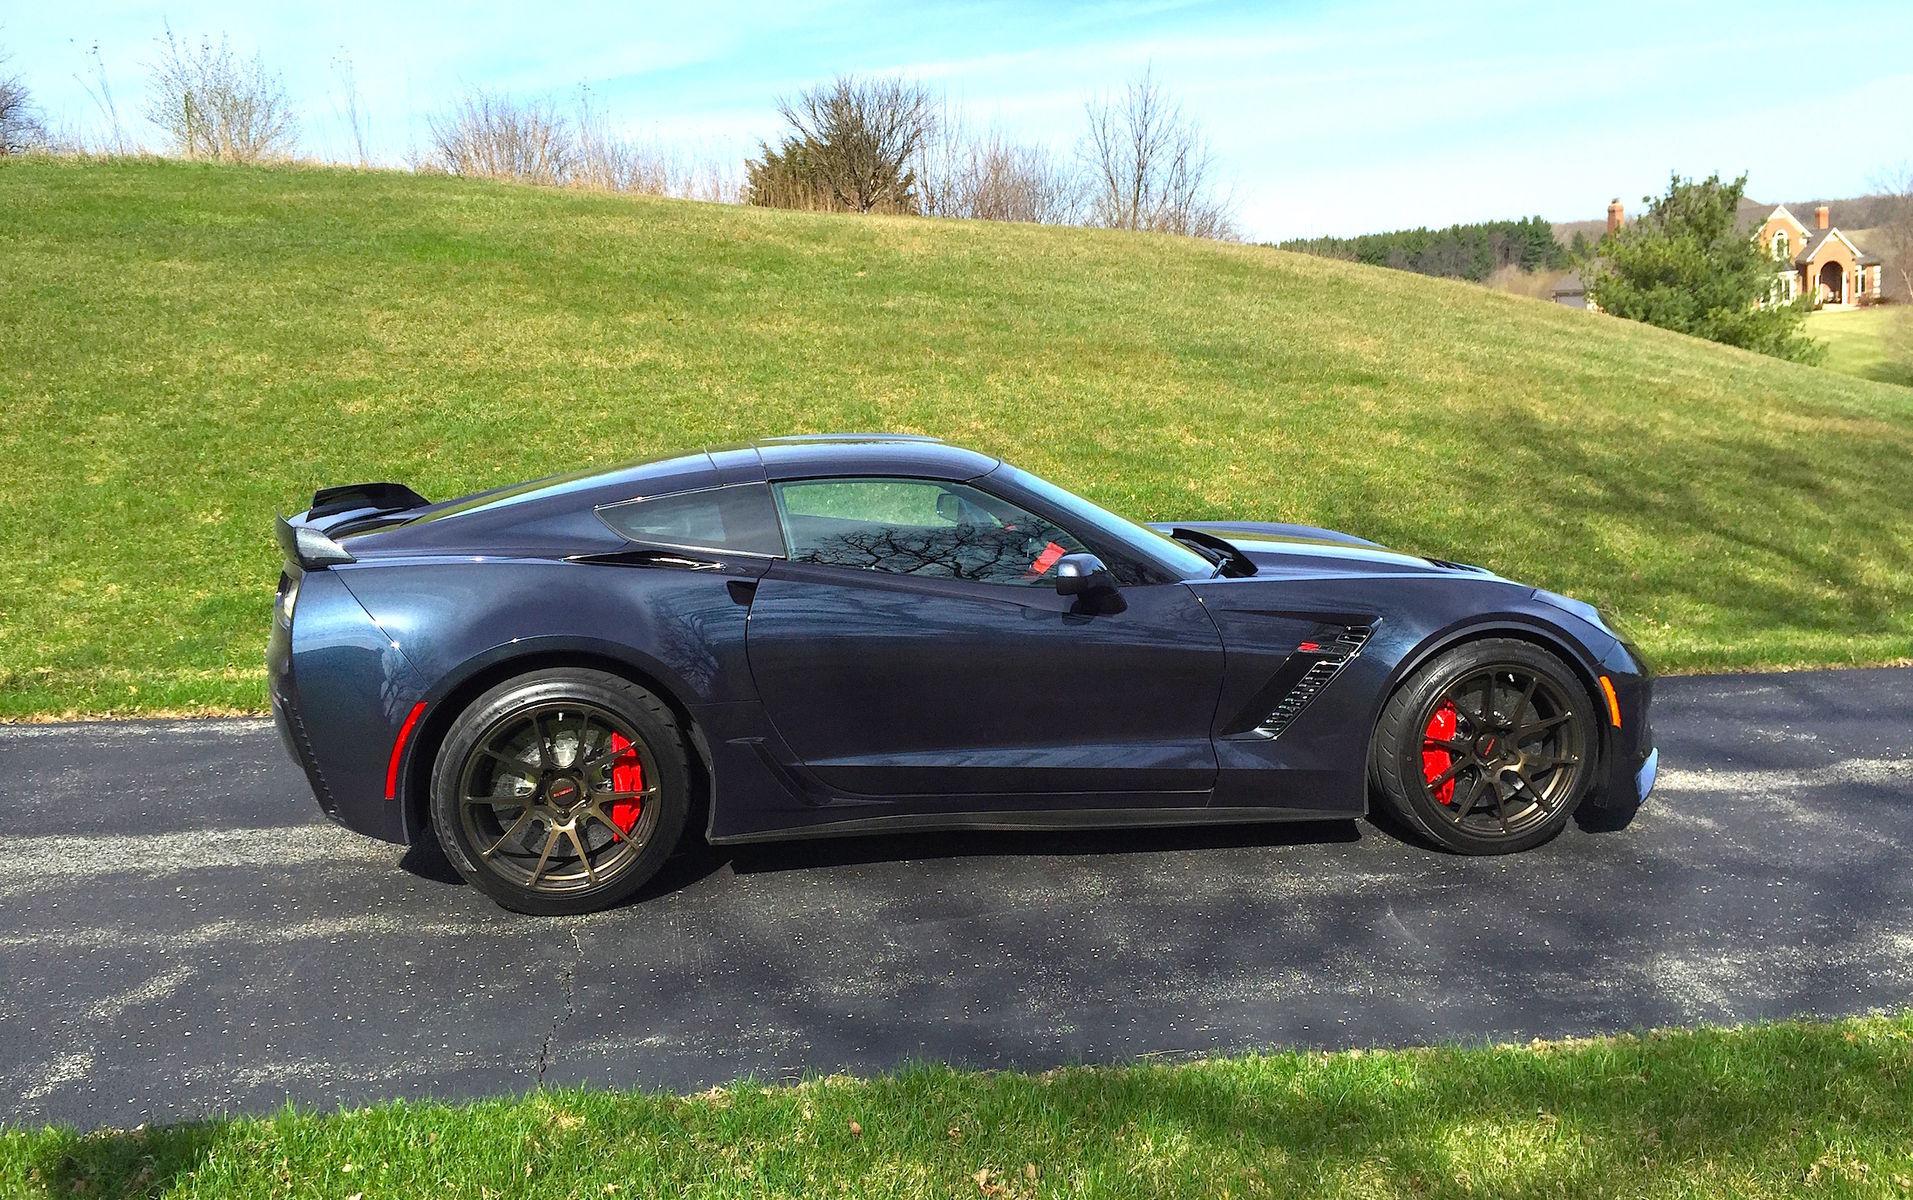 2015 Chevrolet Corvette Z06 | Schwartz Performance C7 Z06 Corvette on Forgeline GA1R Open Lug Cap Edition Wheels